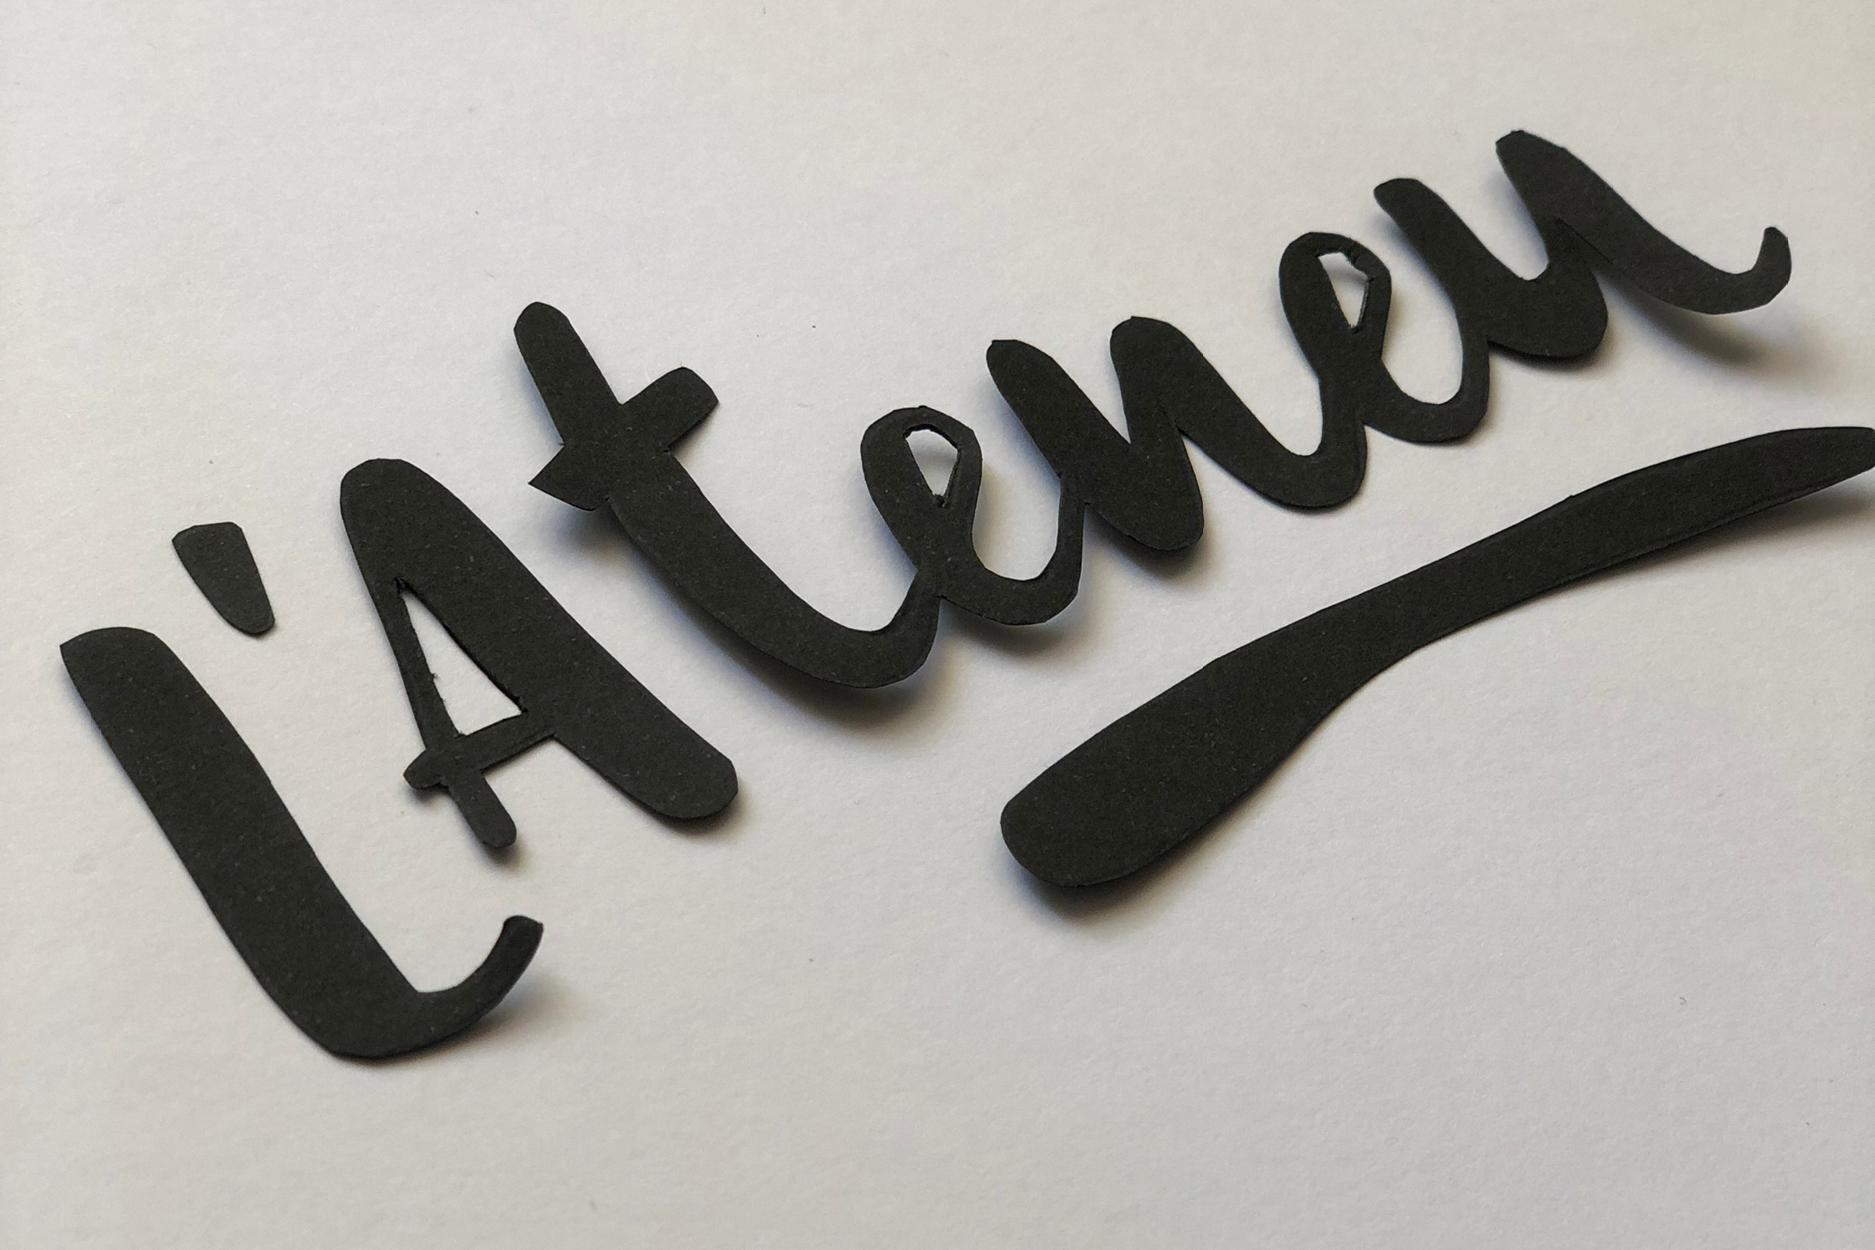 Ateneu Cursos i tallers_web3.jpg